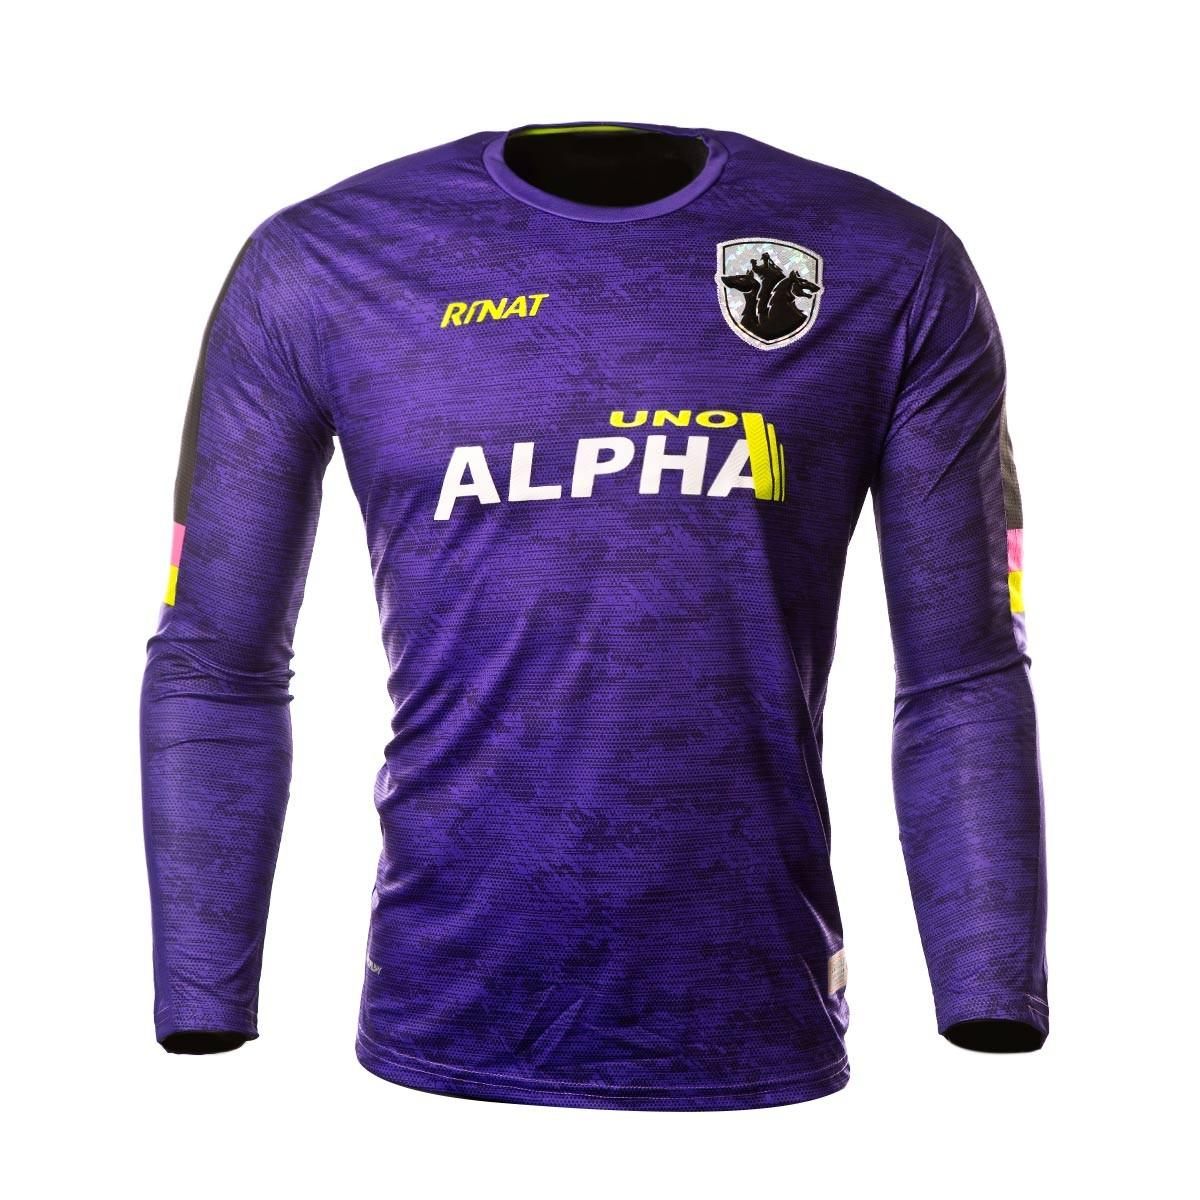 75f4604a6 Jersey Rinat Uno Alpha Purple - Football store Fútbol Emotion